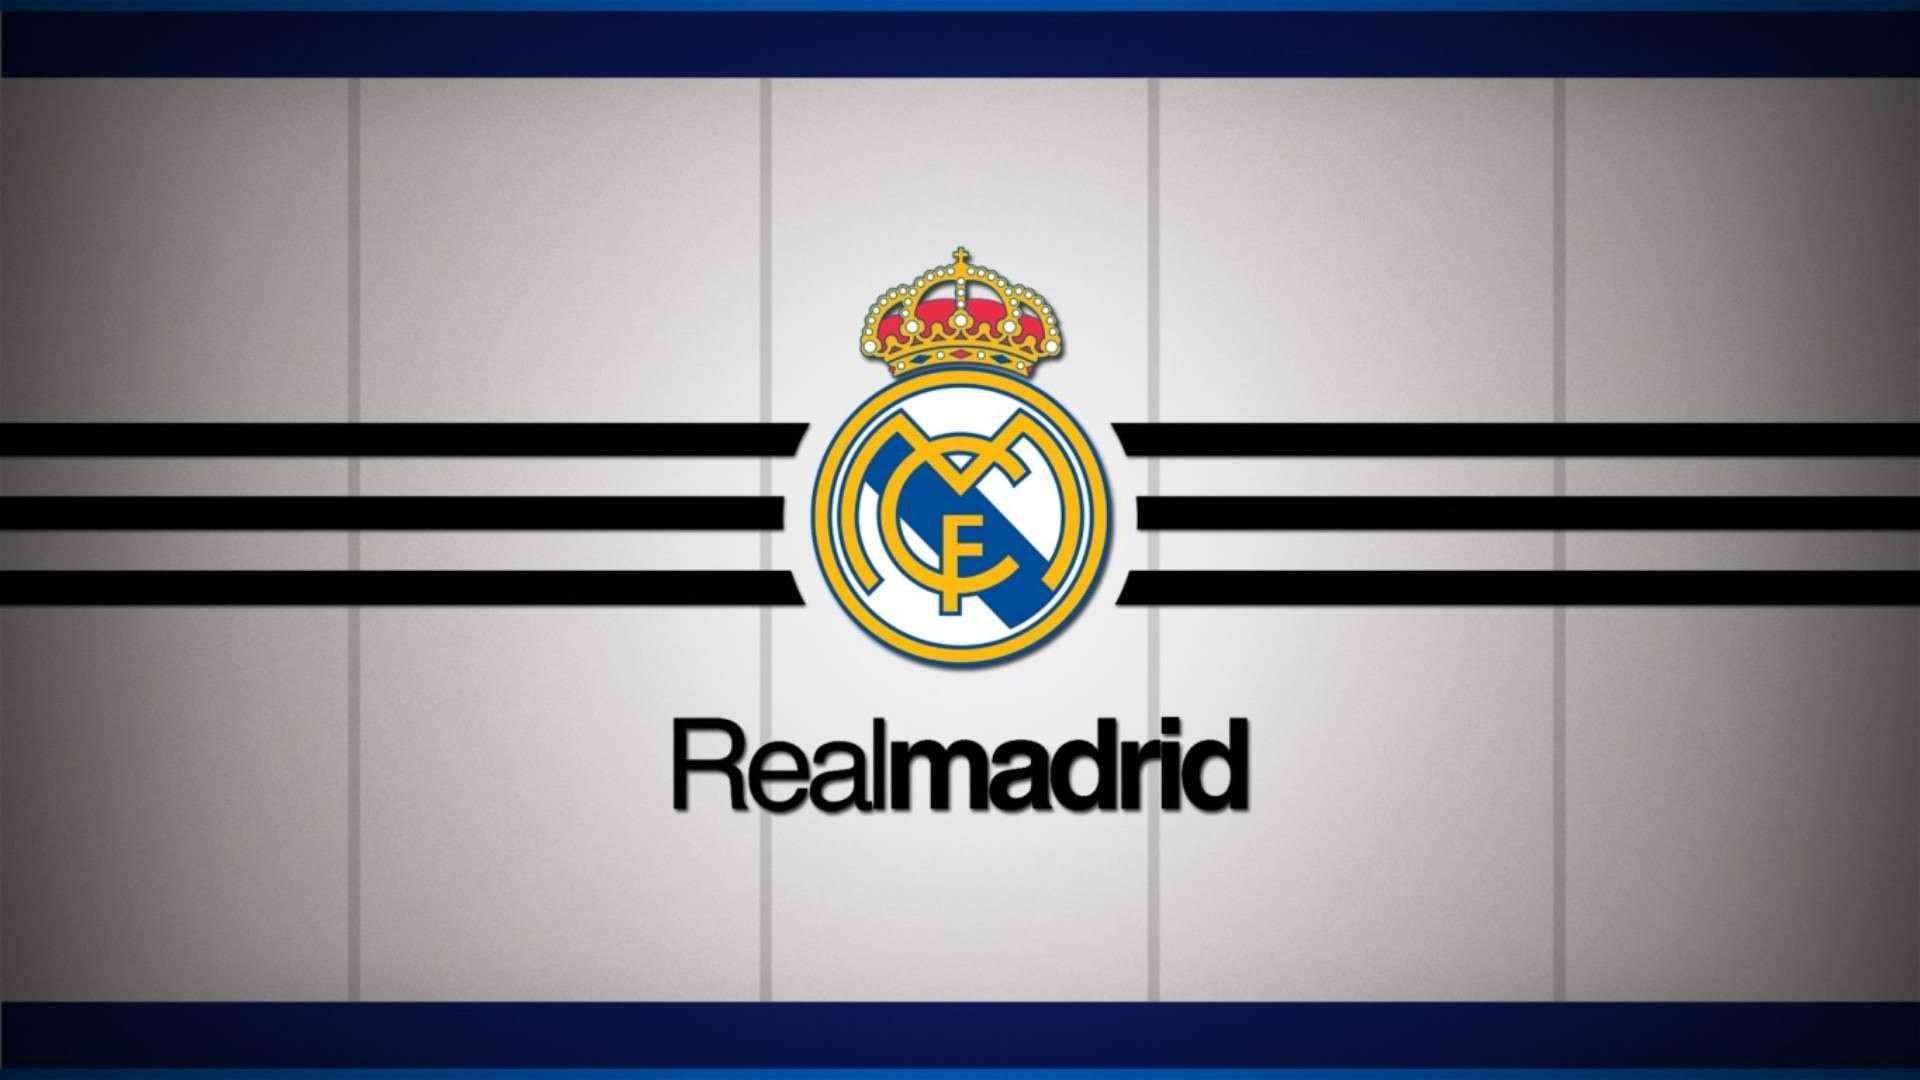 2000x1321 Ronaldo Best Hd Wallpaper